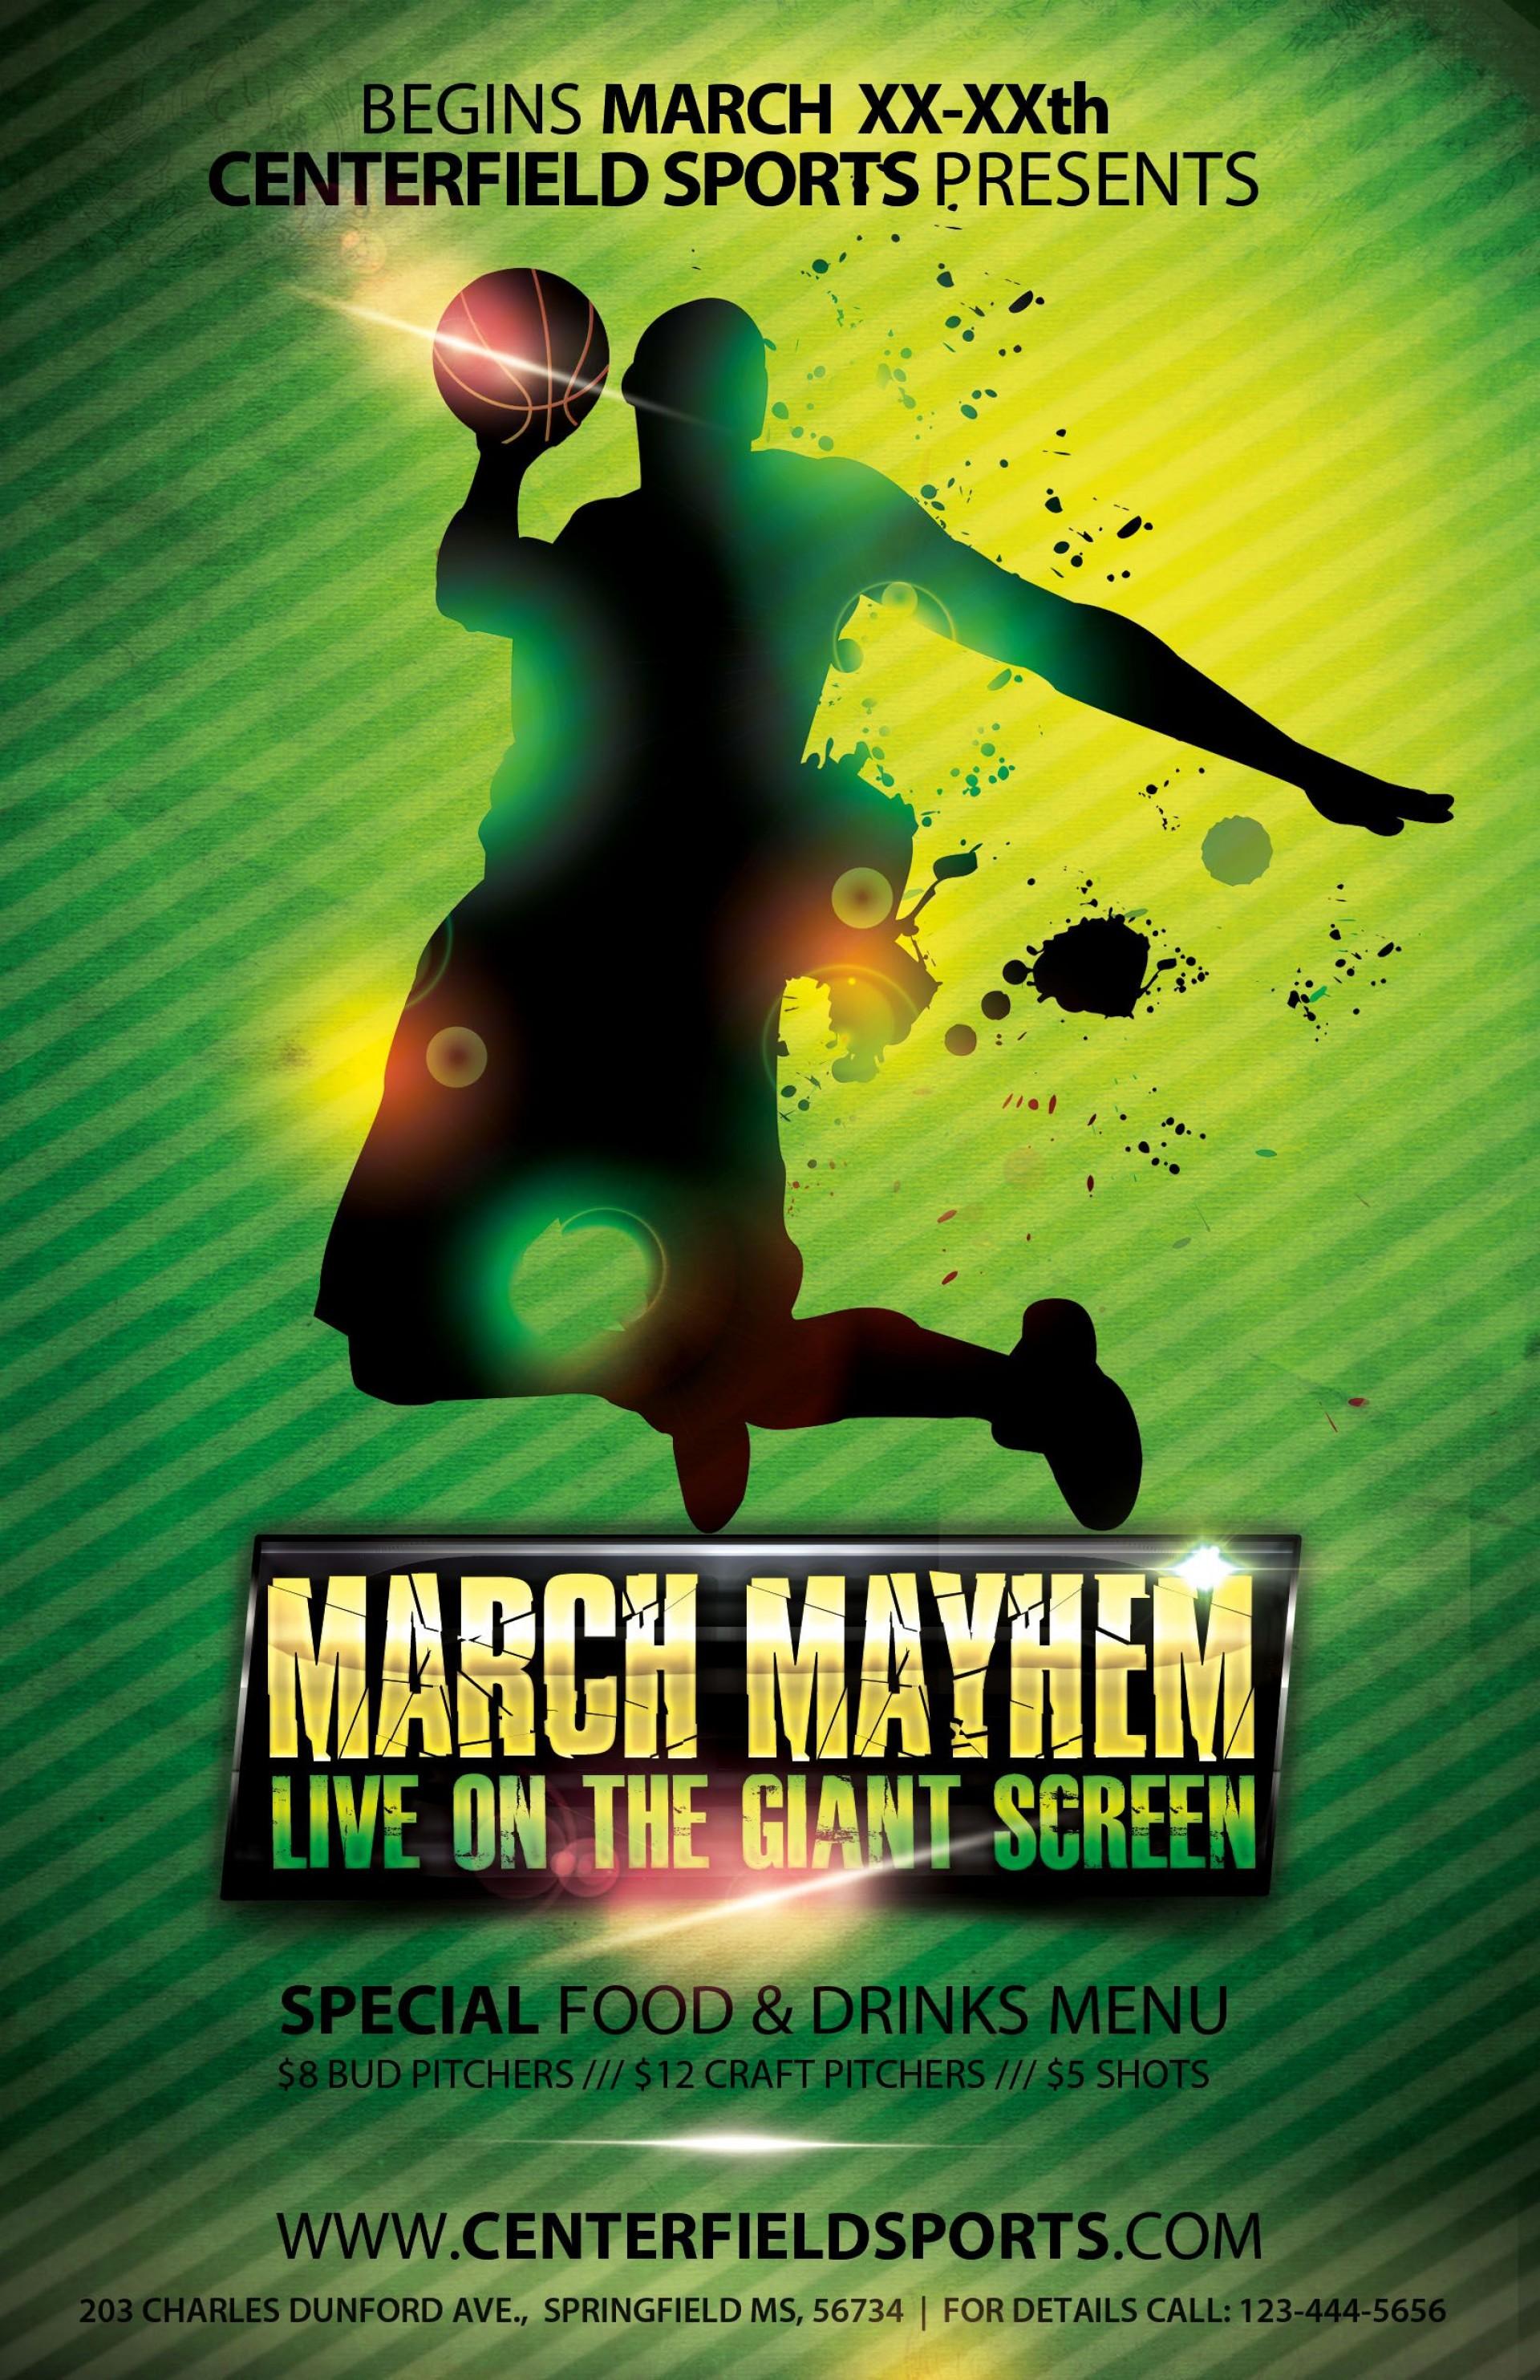 004 Impressive Basketball Flyer Template Free Sample  Brochure Tryout Camp1920